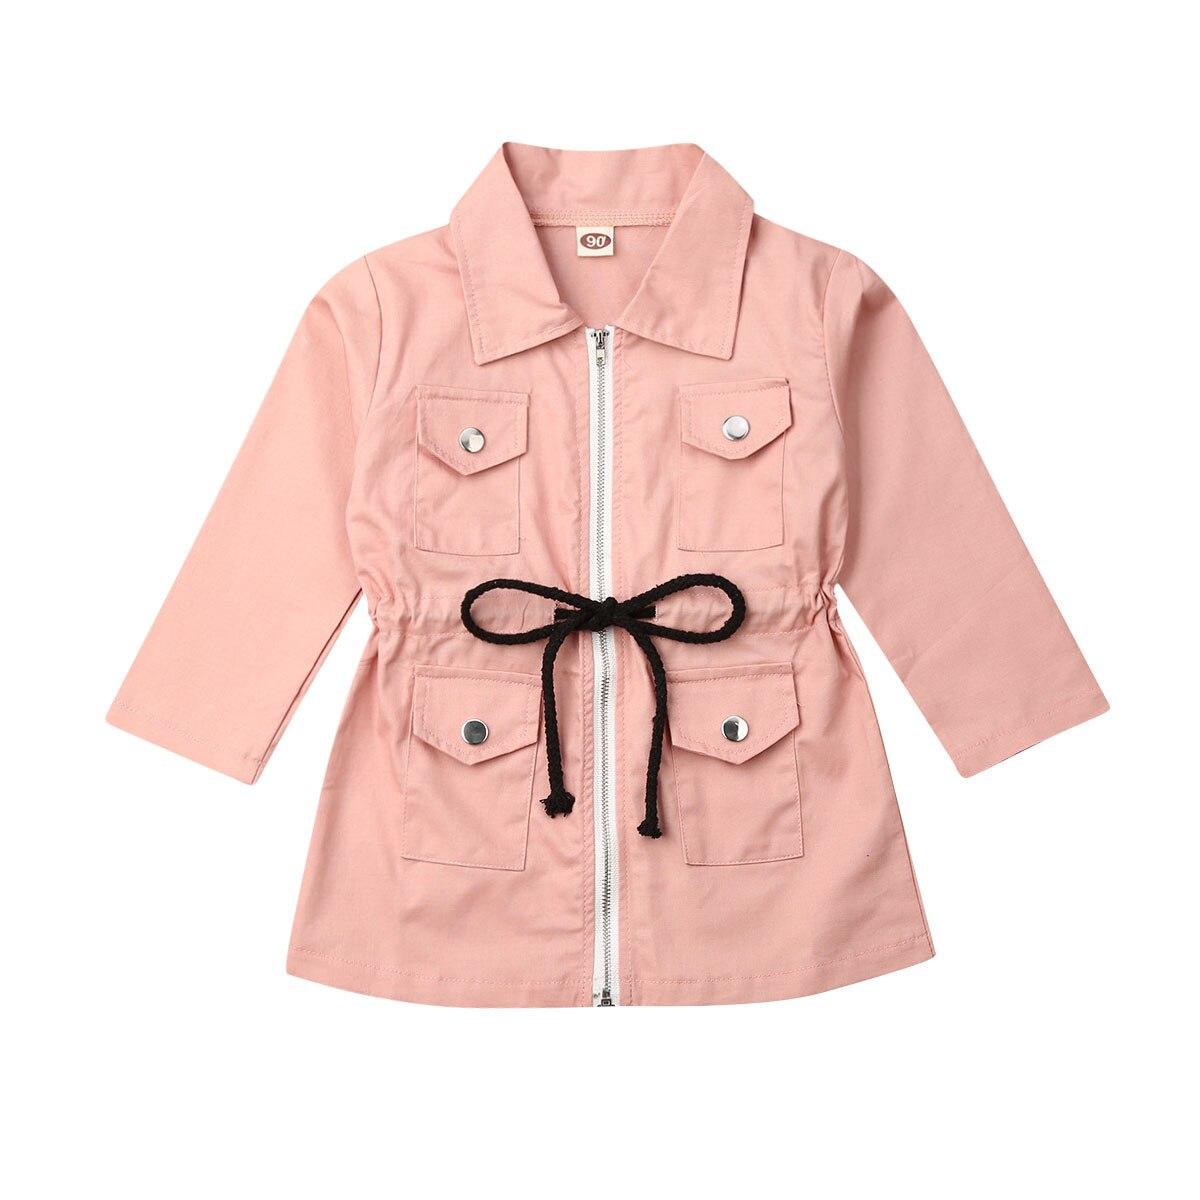 Otoño chico chica Trench manga larga sólido cremallera solapa chaqueta de moda al aire libre 1-7Y chica clothestop